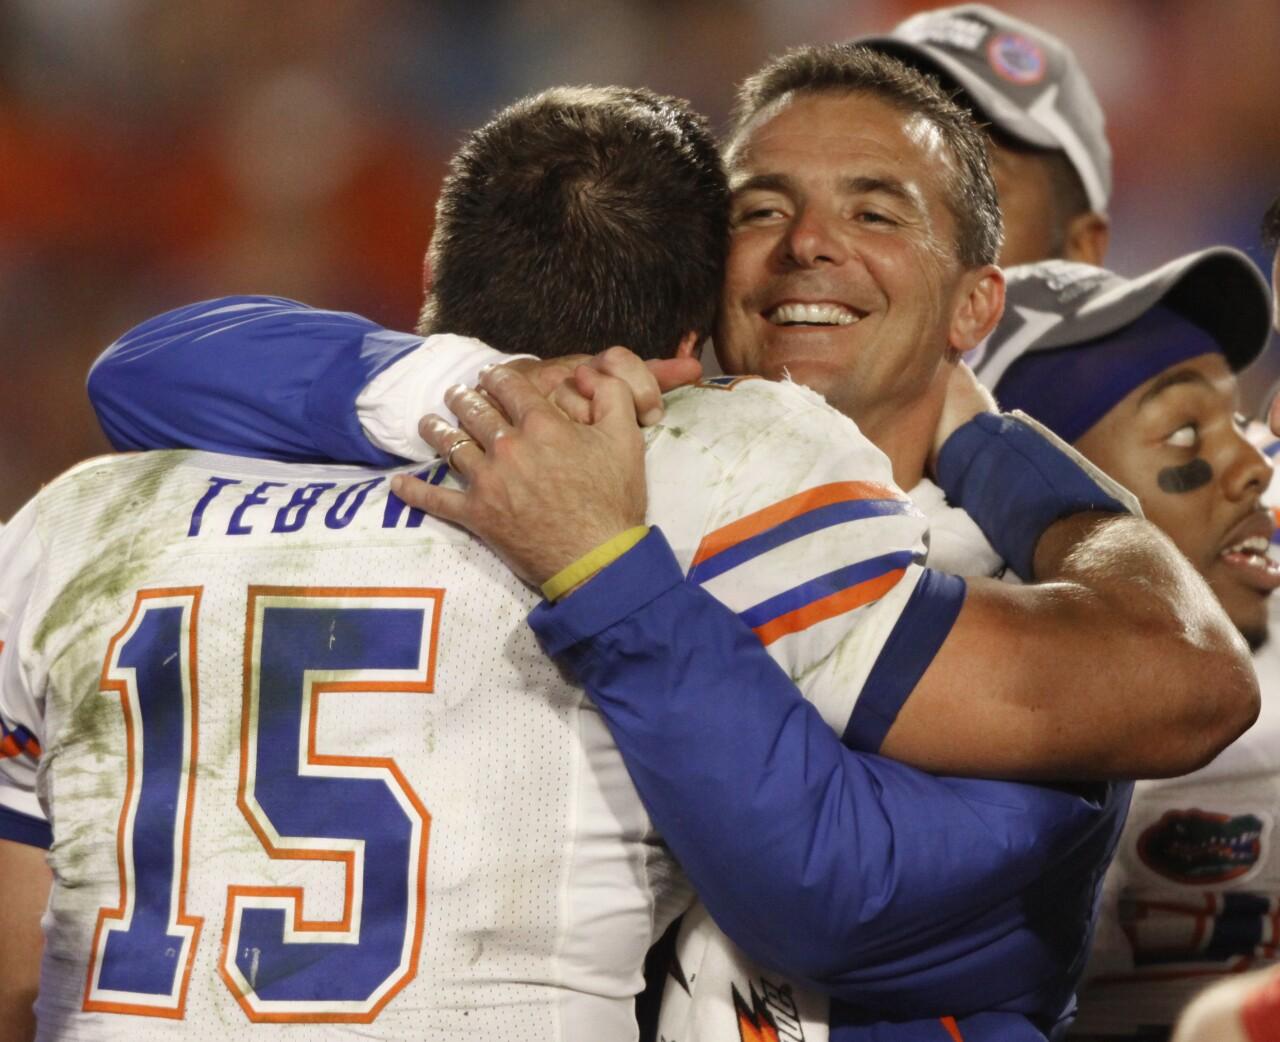 Florida Gators head coach Urban Meyer hugs QB Tim Tebow after winning 2009 BCS National Championship game